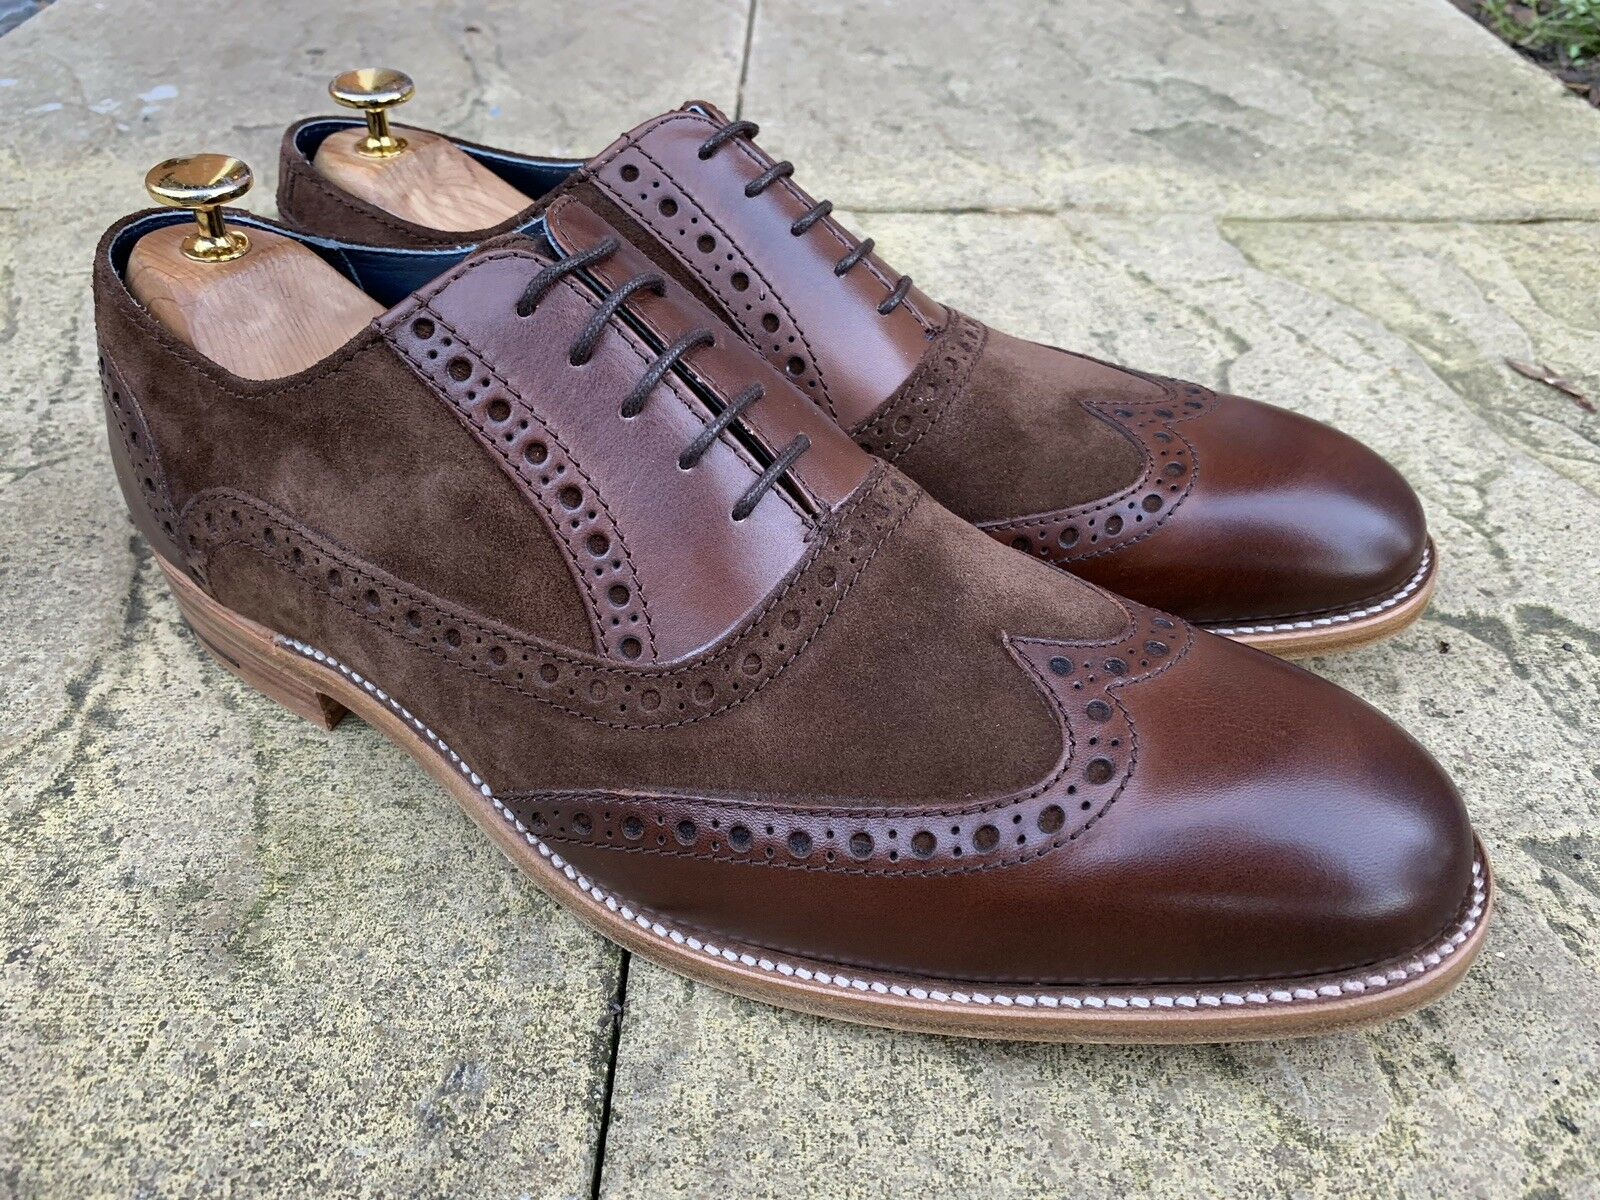 Barker Grant Wing Punta Brogue Zapatos Gamuza Becerro De Nogal UK 10 nos 11 Ganga